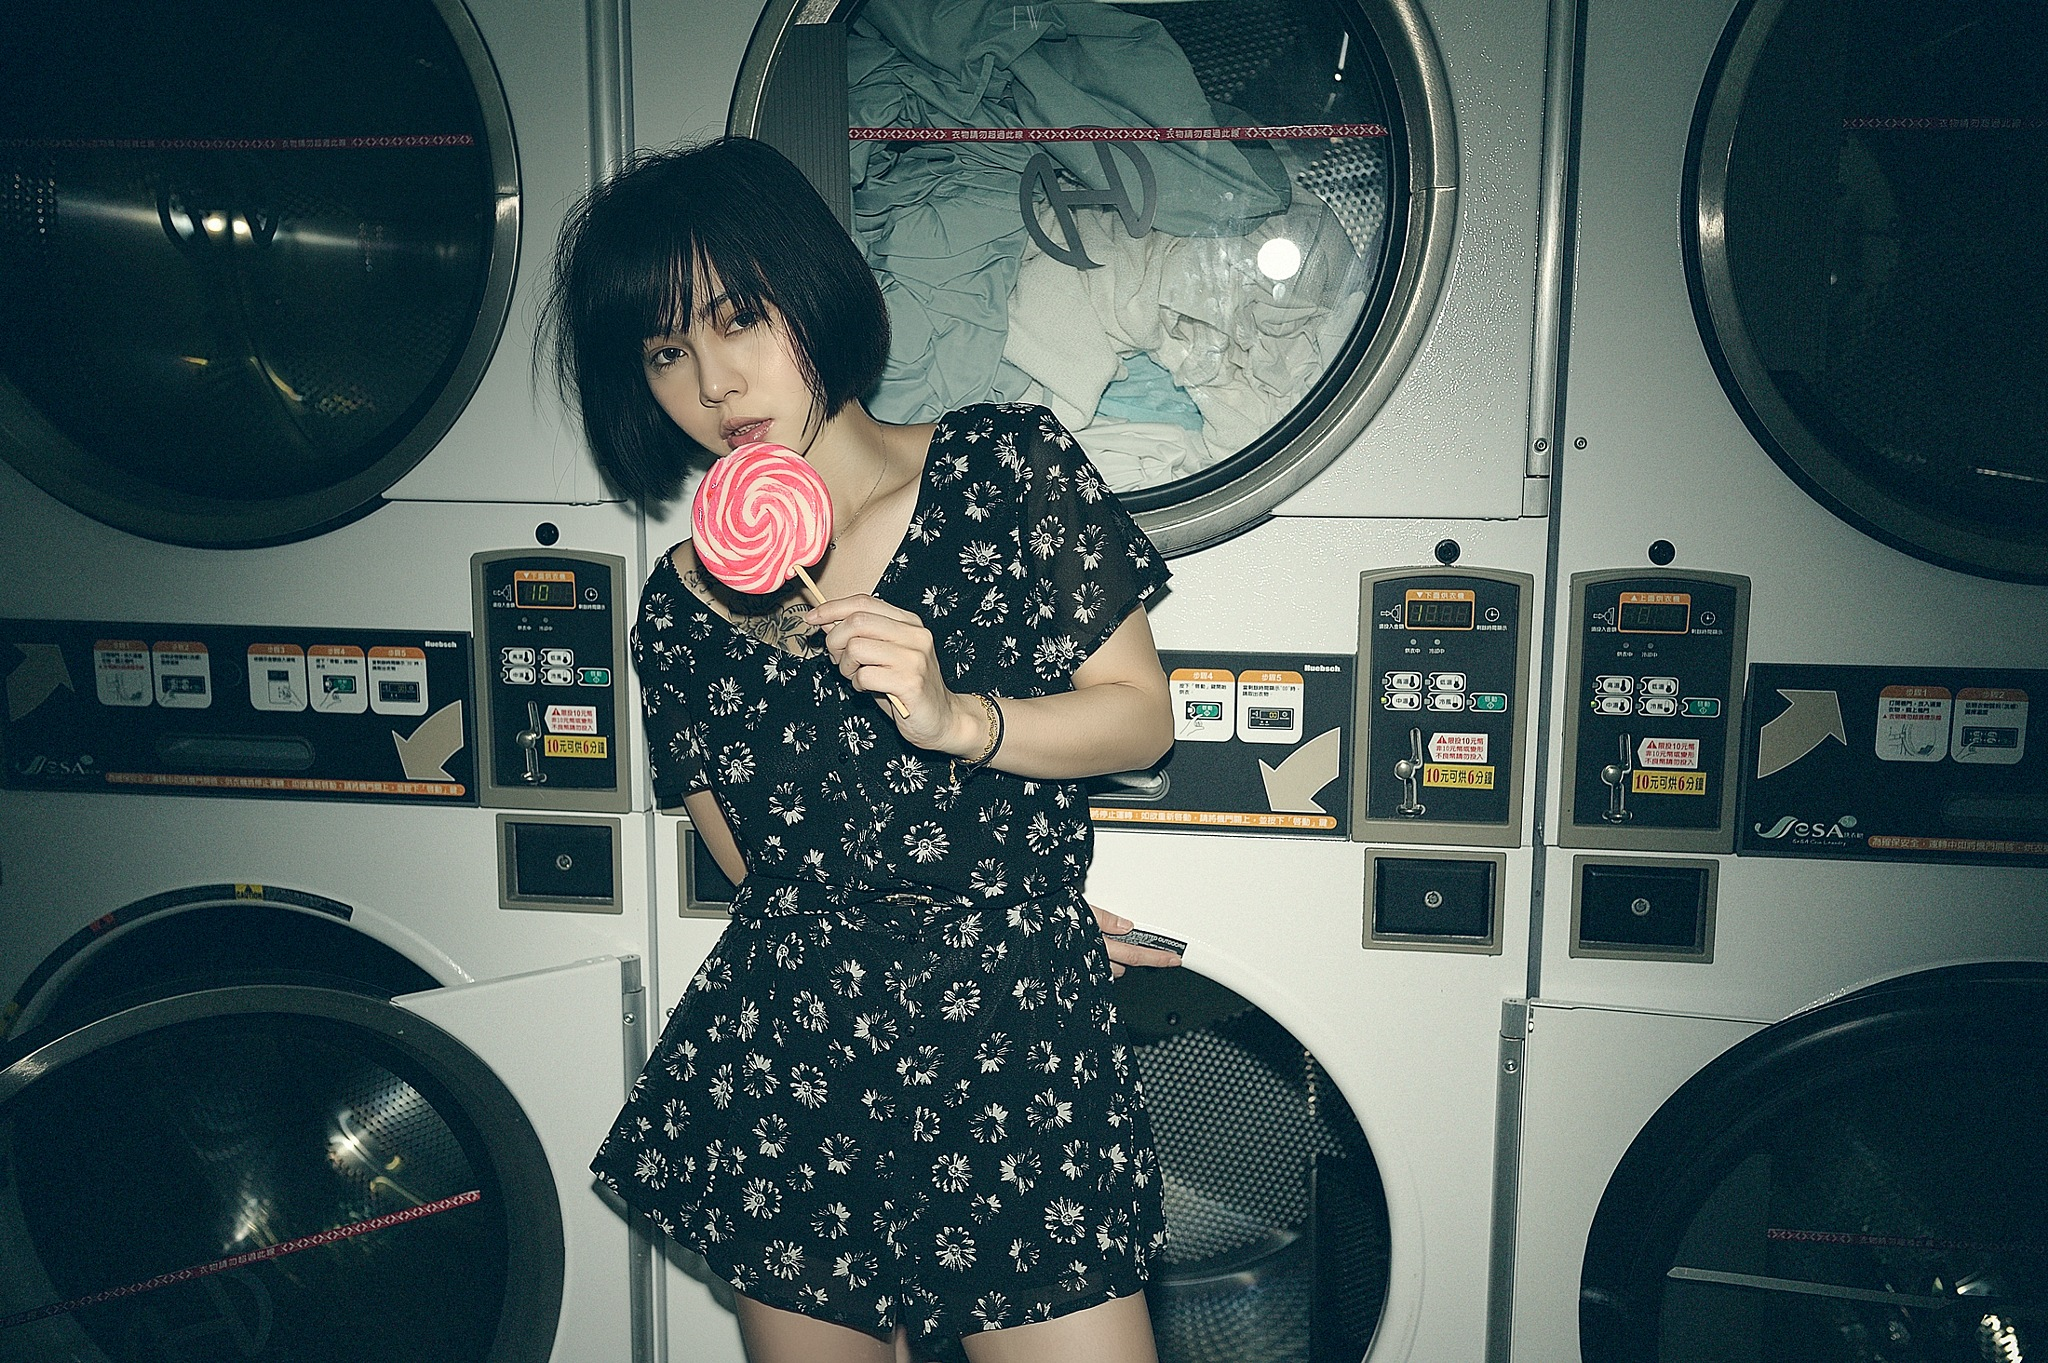 Laundry girl by Yi-Chen Chung